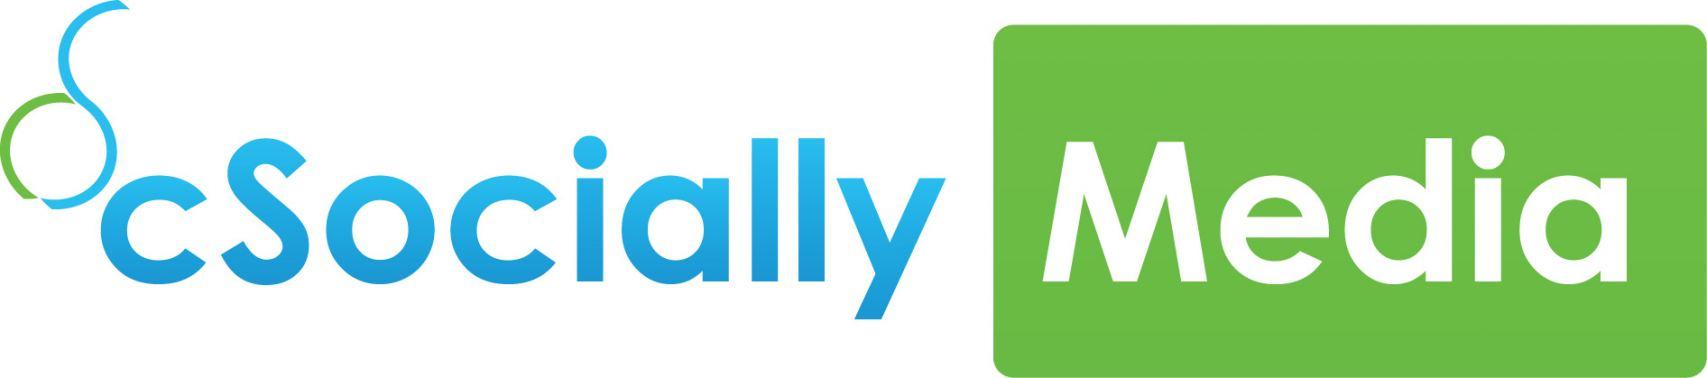 cSocially Media Logo